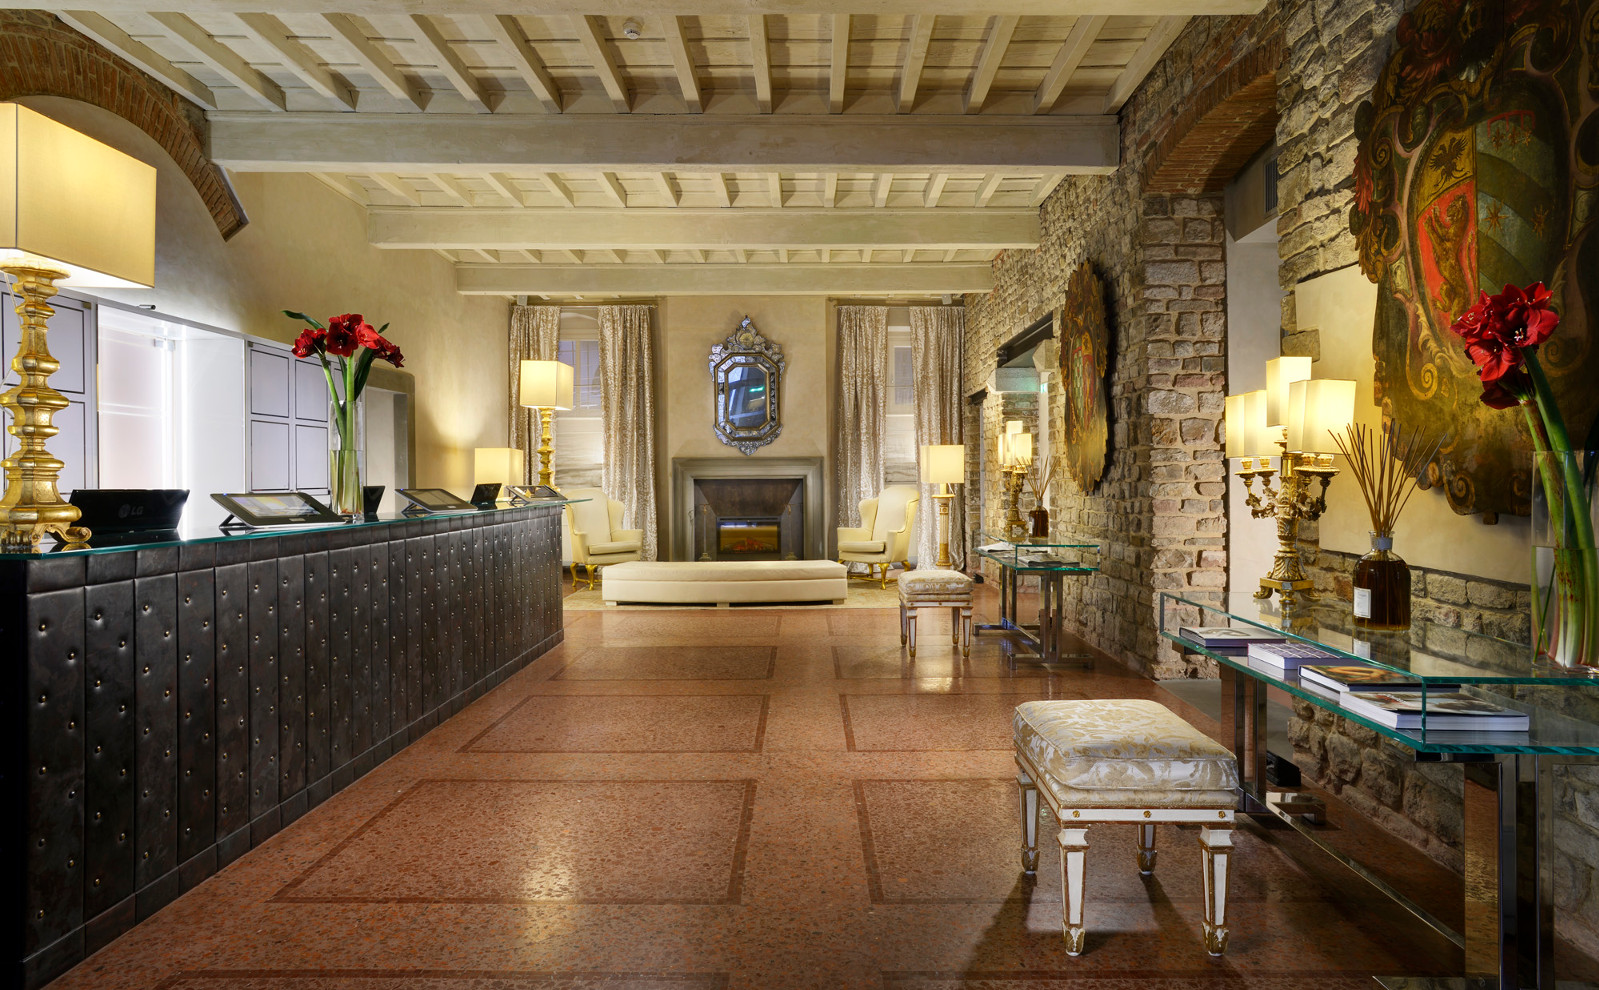 Hotel Brunelleschi in Florence Italy